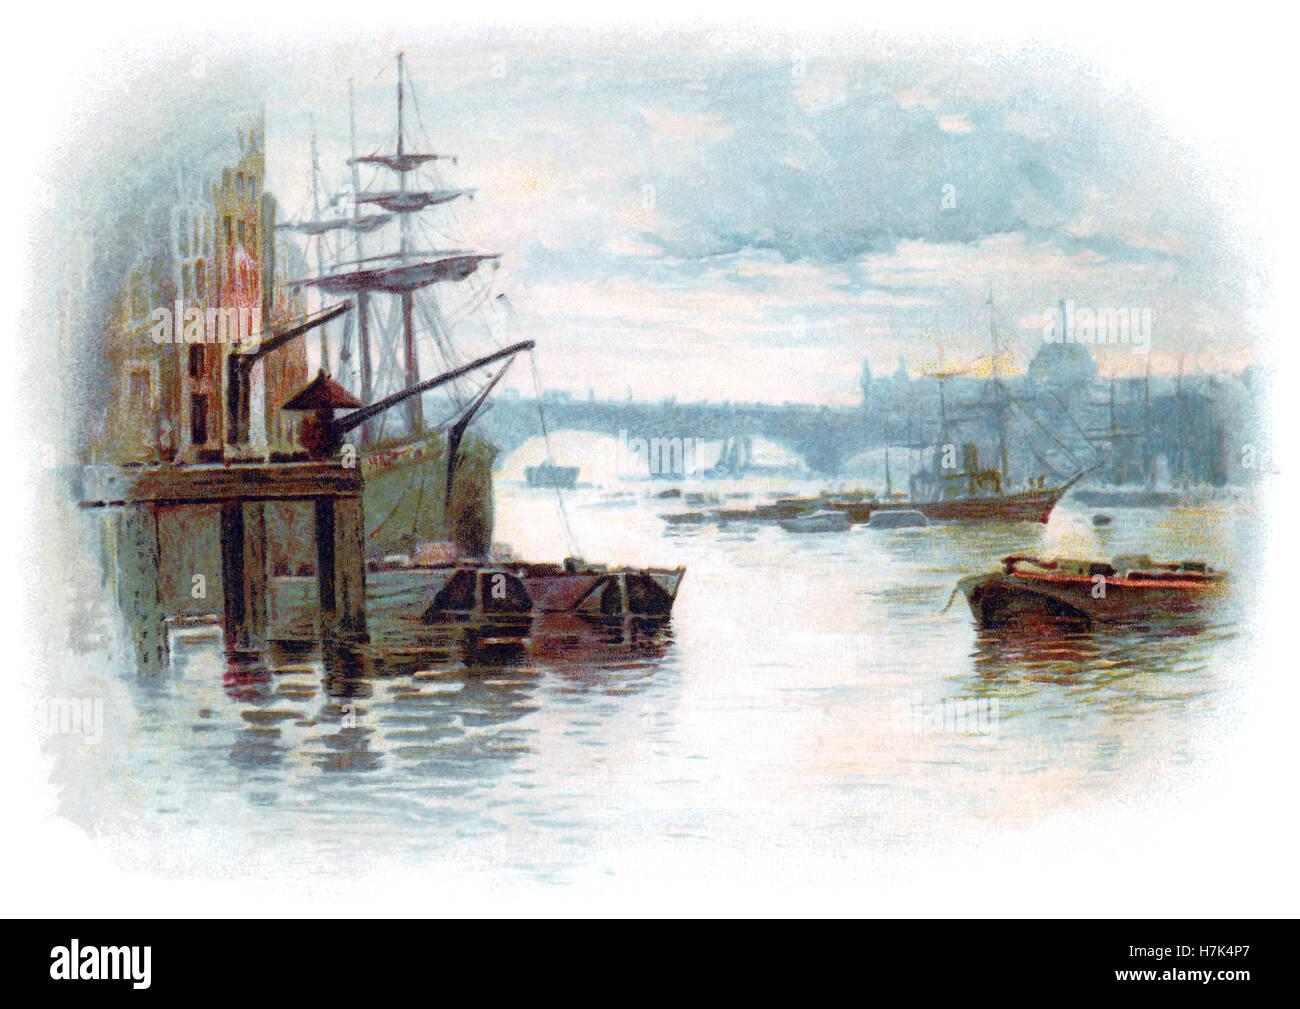 Edwardian illustration of the River Thames and London Bridge - Stock Image